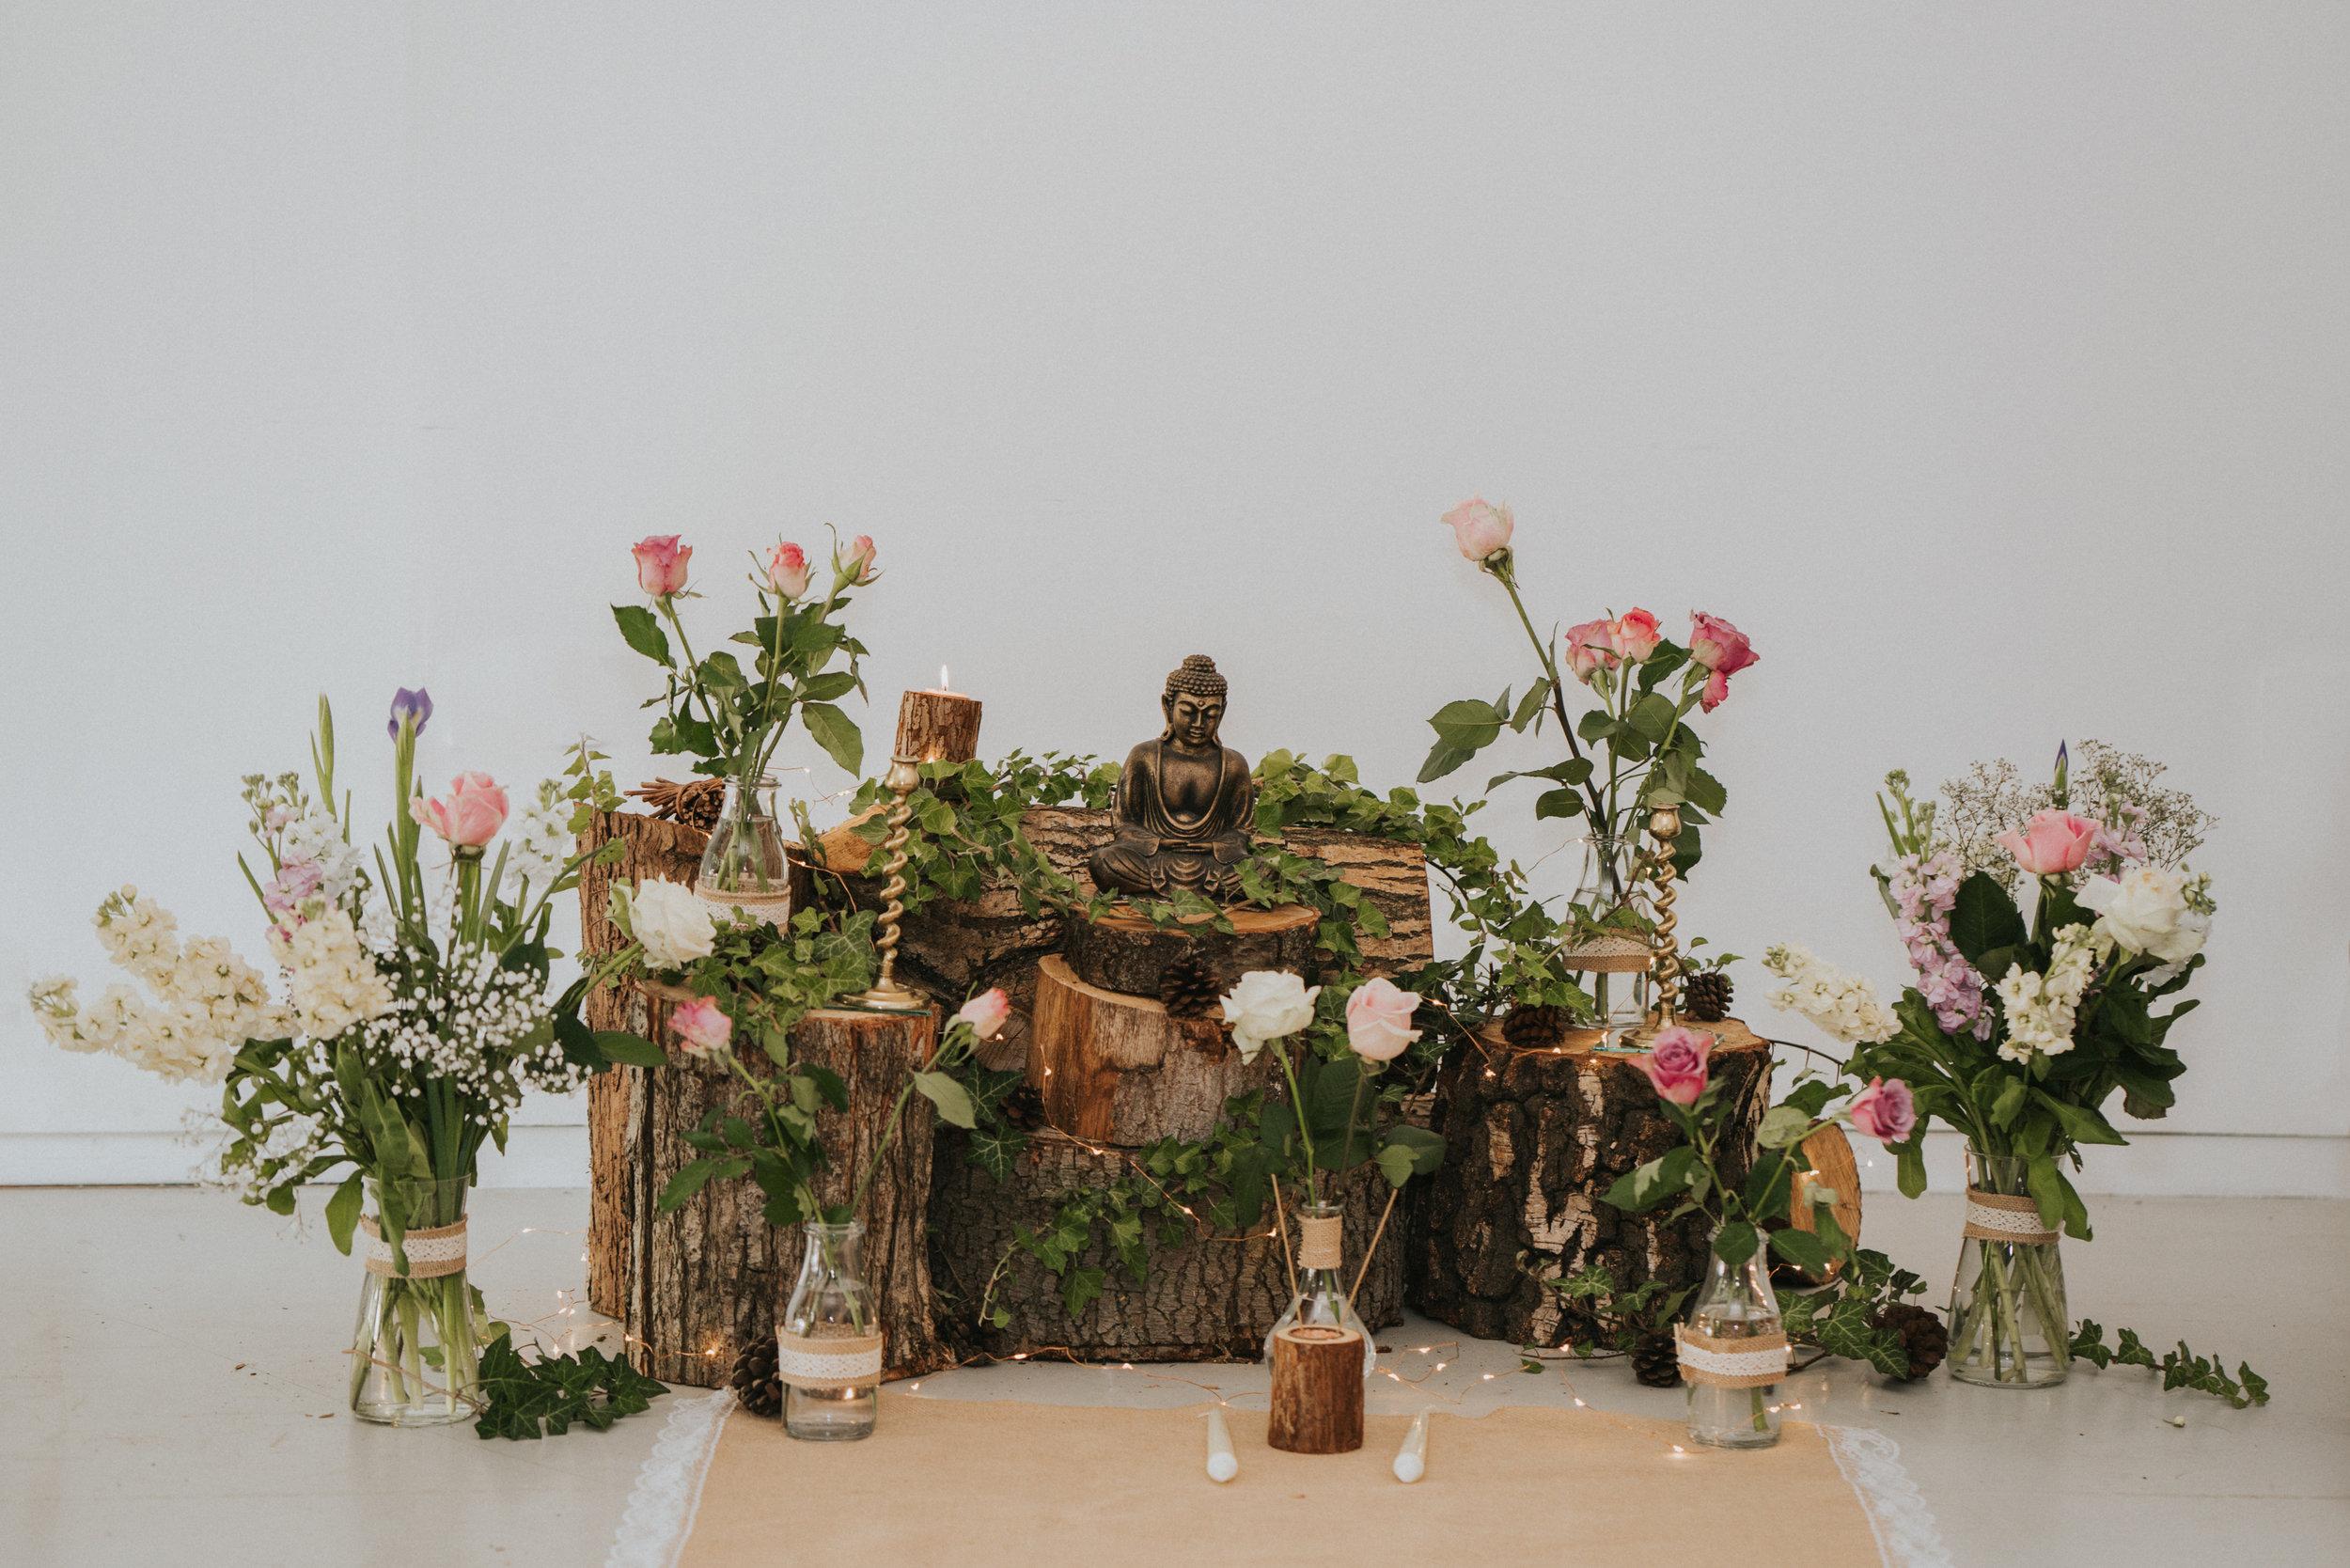 Grace-Elizabeth-Georgie-Amalaketu-Firstsite-Colchester-Essex-Boho-Buddhist-Wedding-Alternative-Wedding-Photography-Essex (33 of 100).jpg